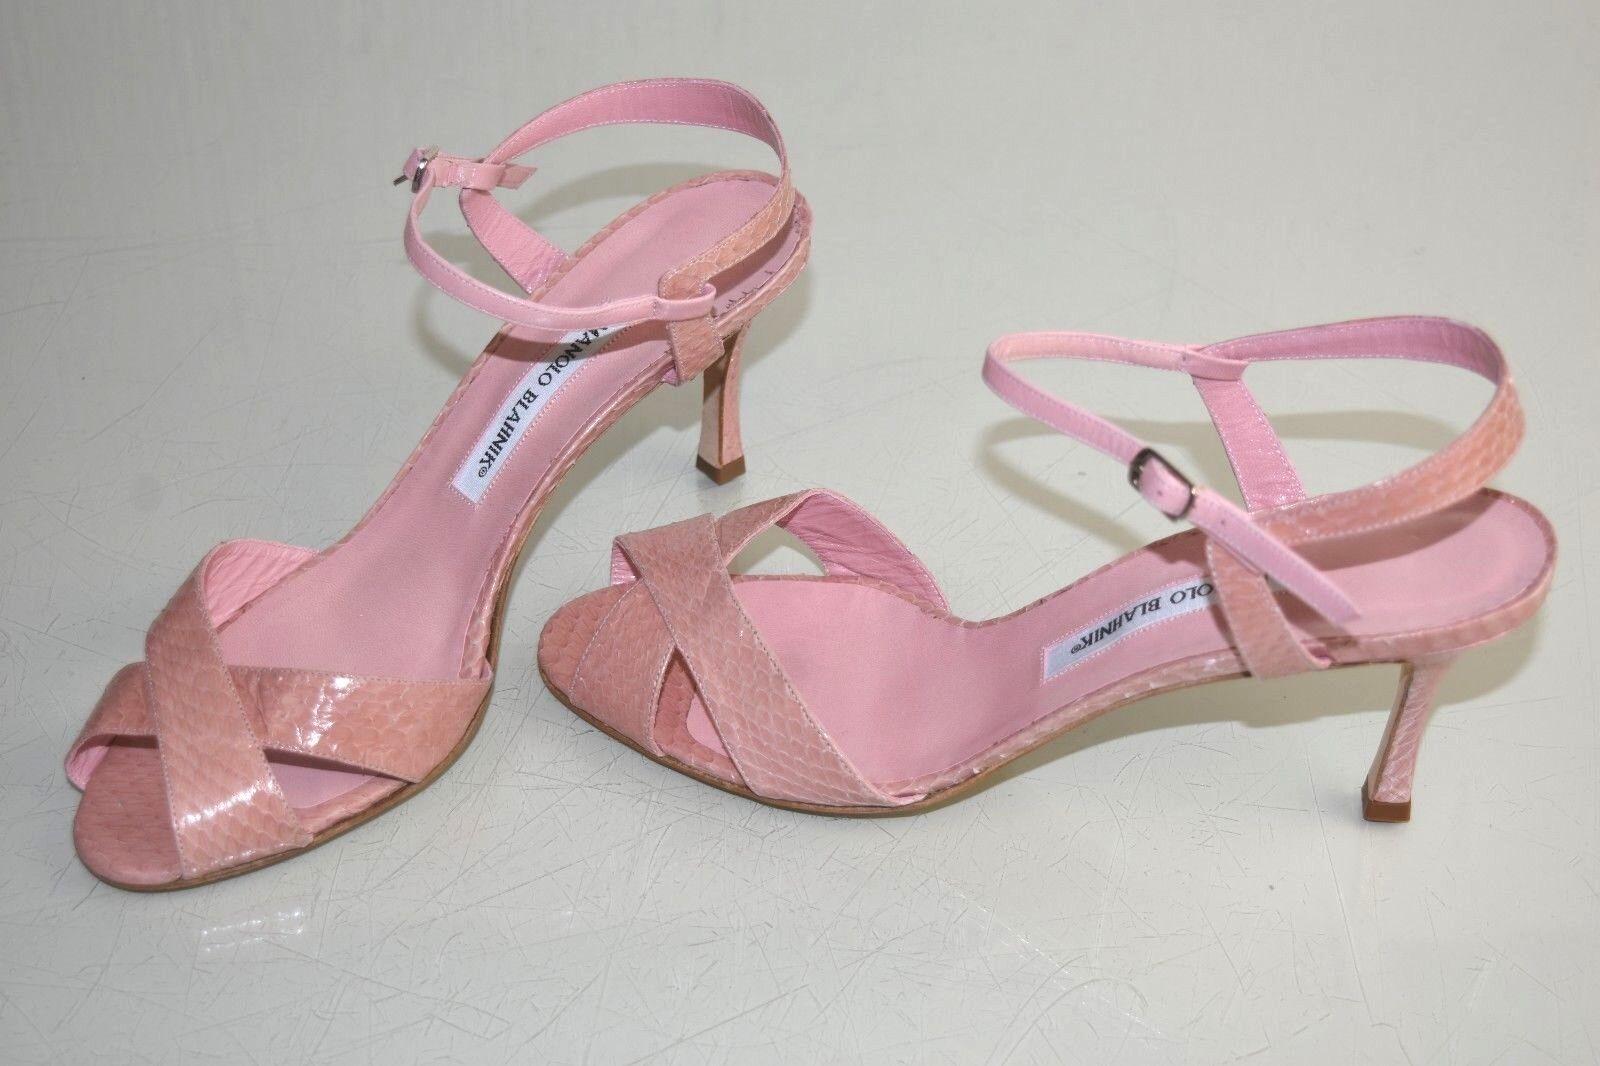 NEW Manolo Blahnik EXOTIC Snakeskin Snakeskin Snakeskin PYTHON Sandals Pumps Heels Pink shoes 40.5 6303c4